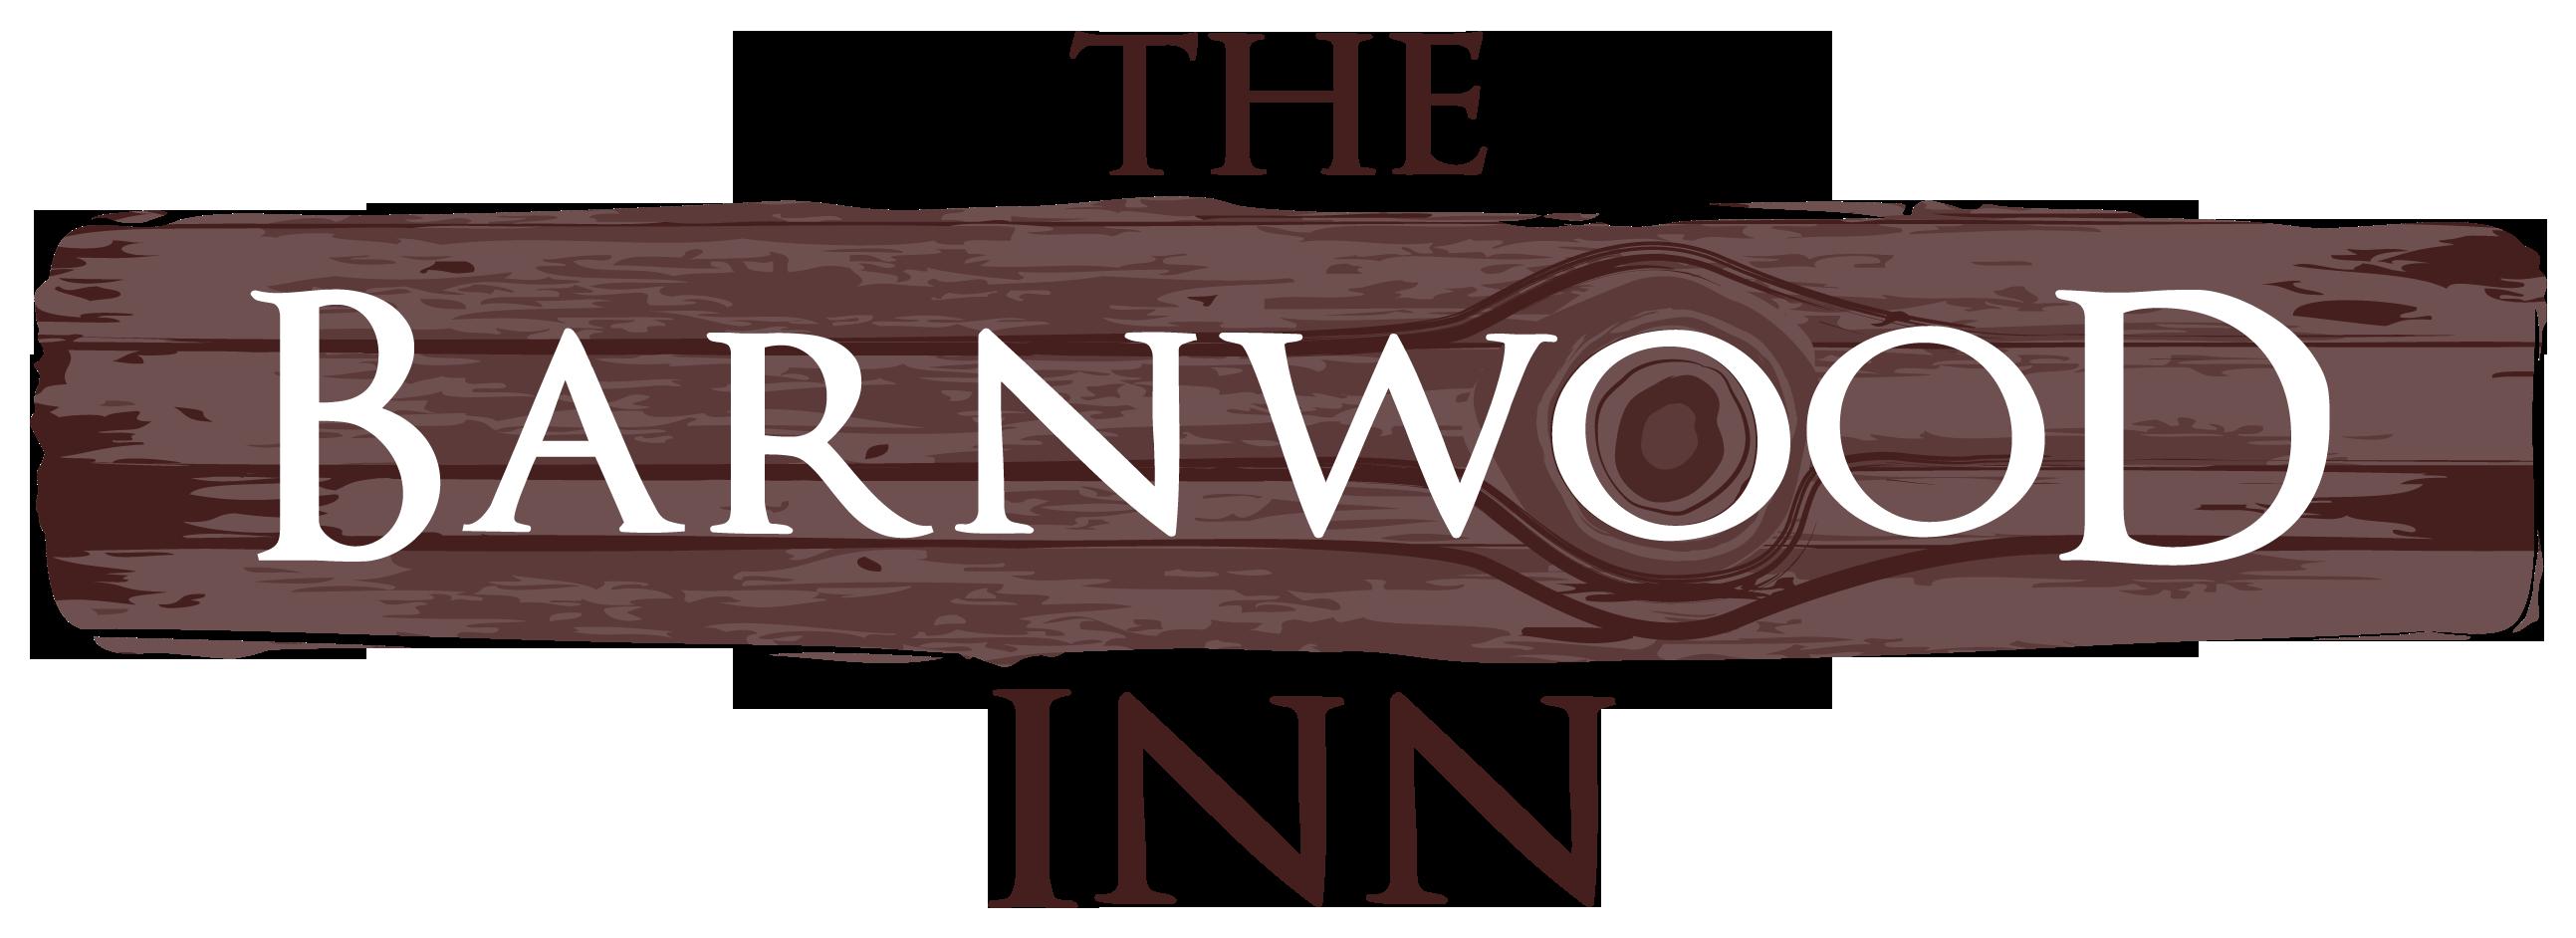 thebarnwoodinn.com